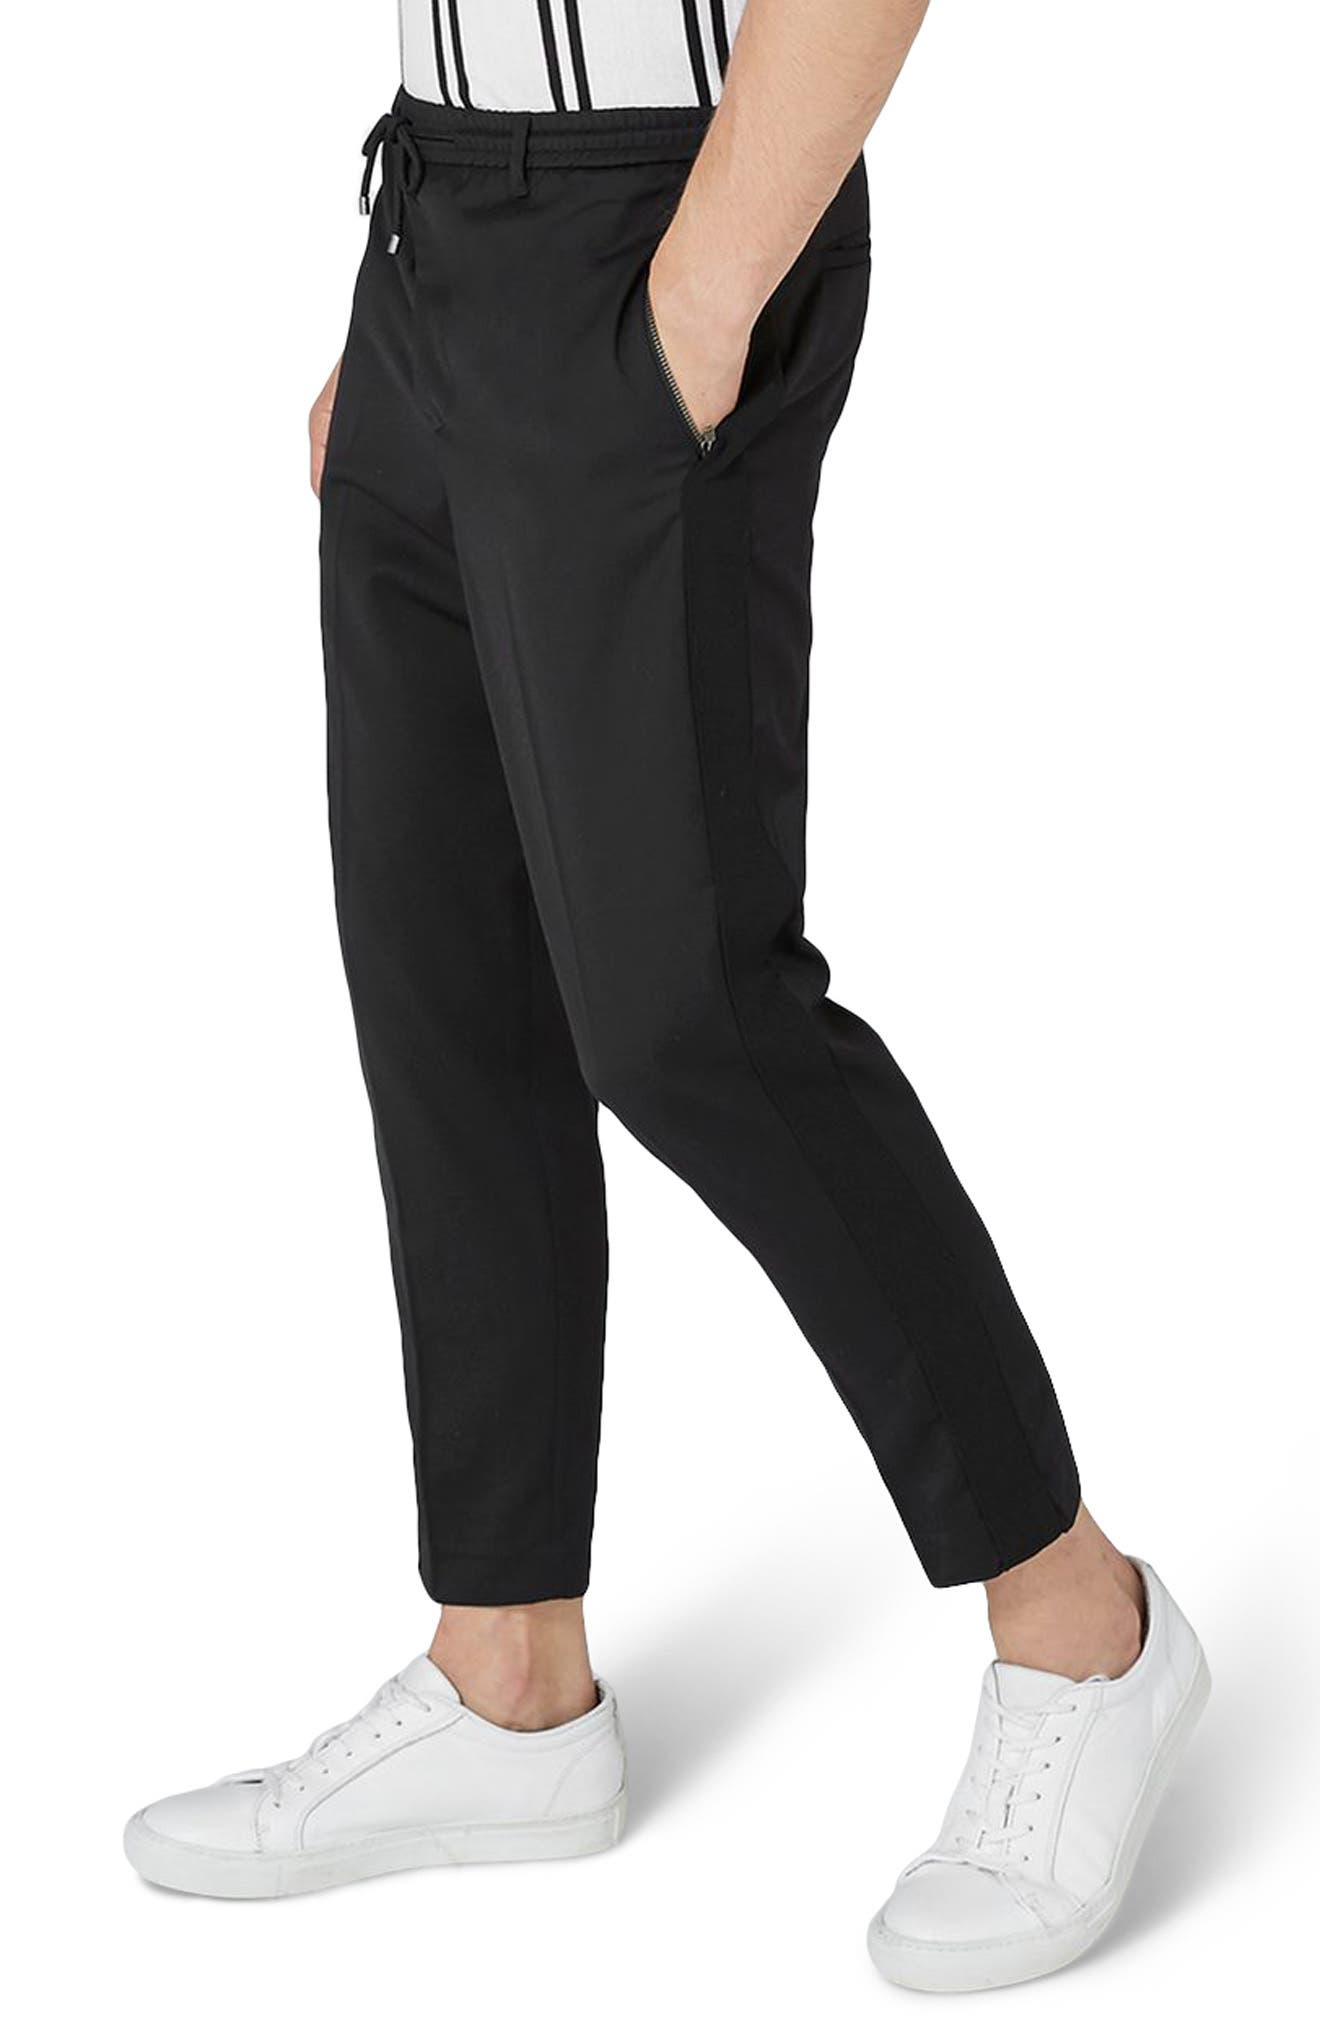 Side Zip Dress Pants,                         Main,                         color, Black